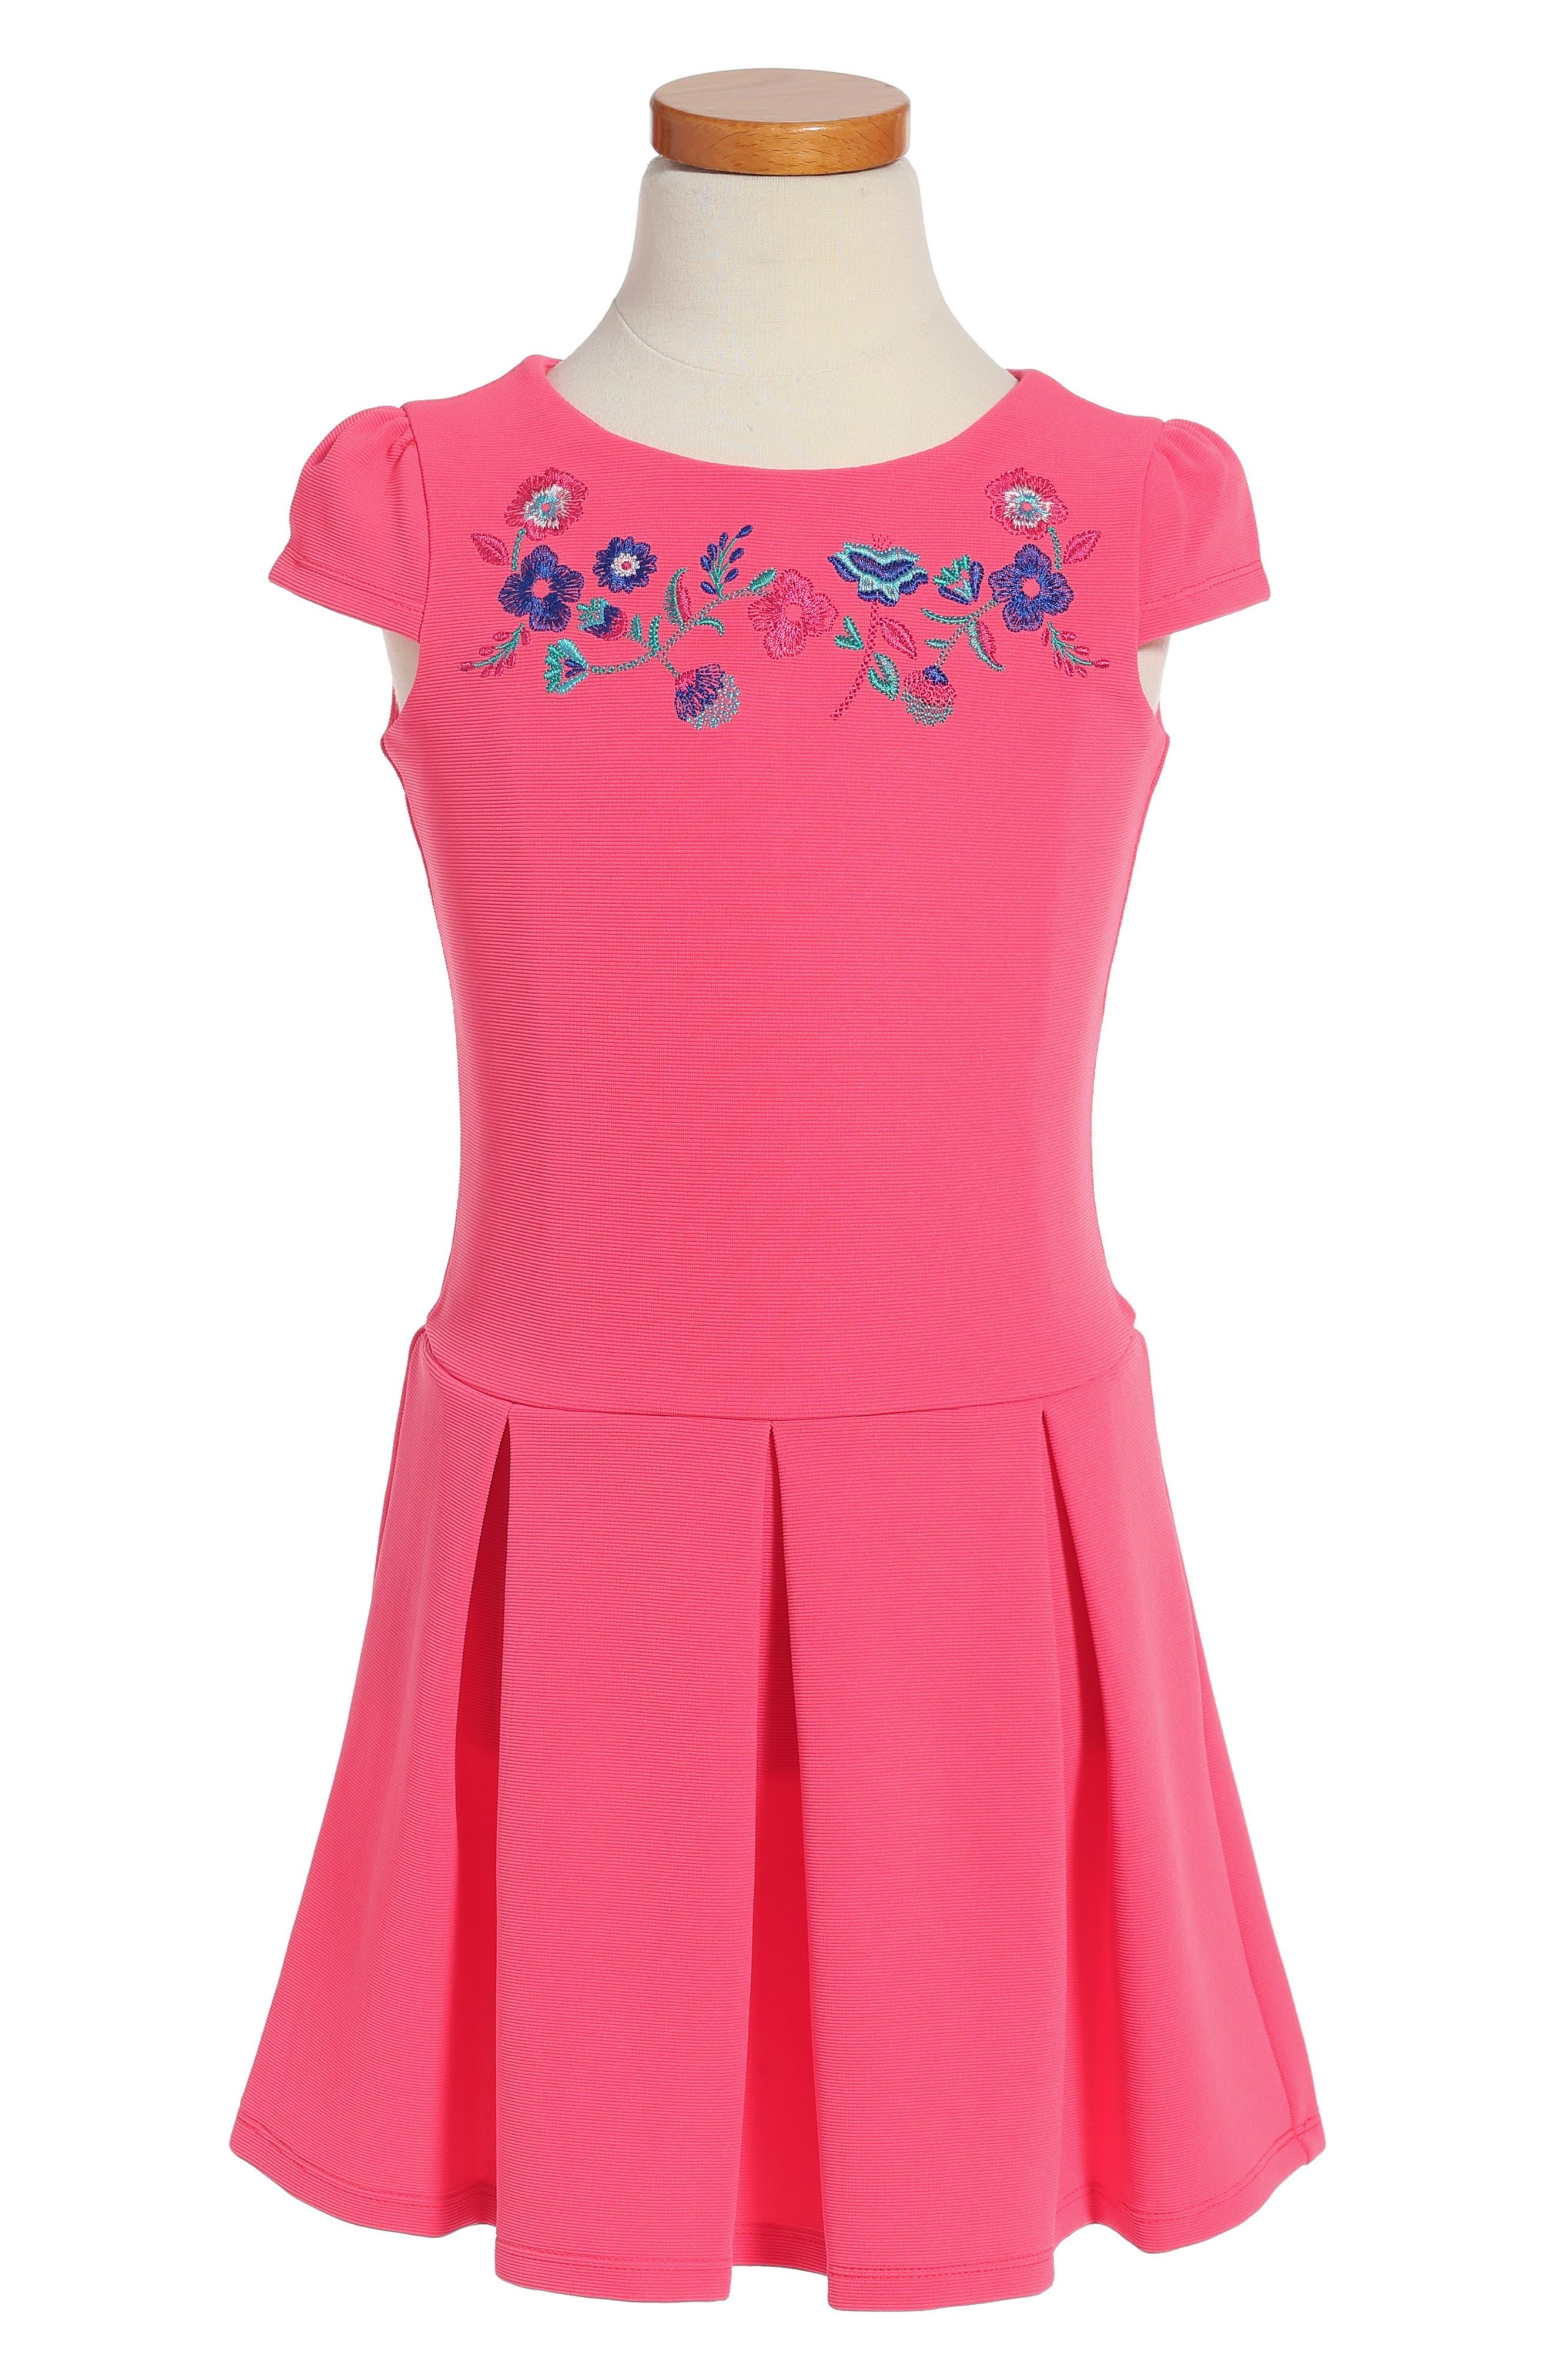 Drop Waist Dress,                             Main thumbnail 1, color,                             650